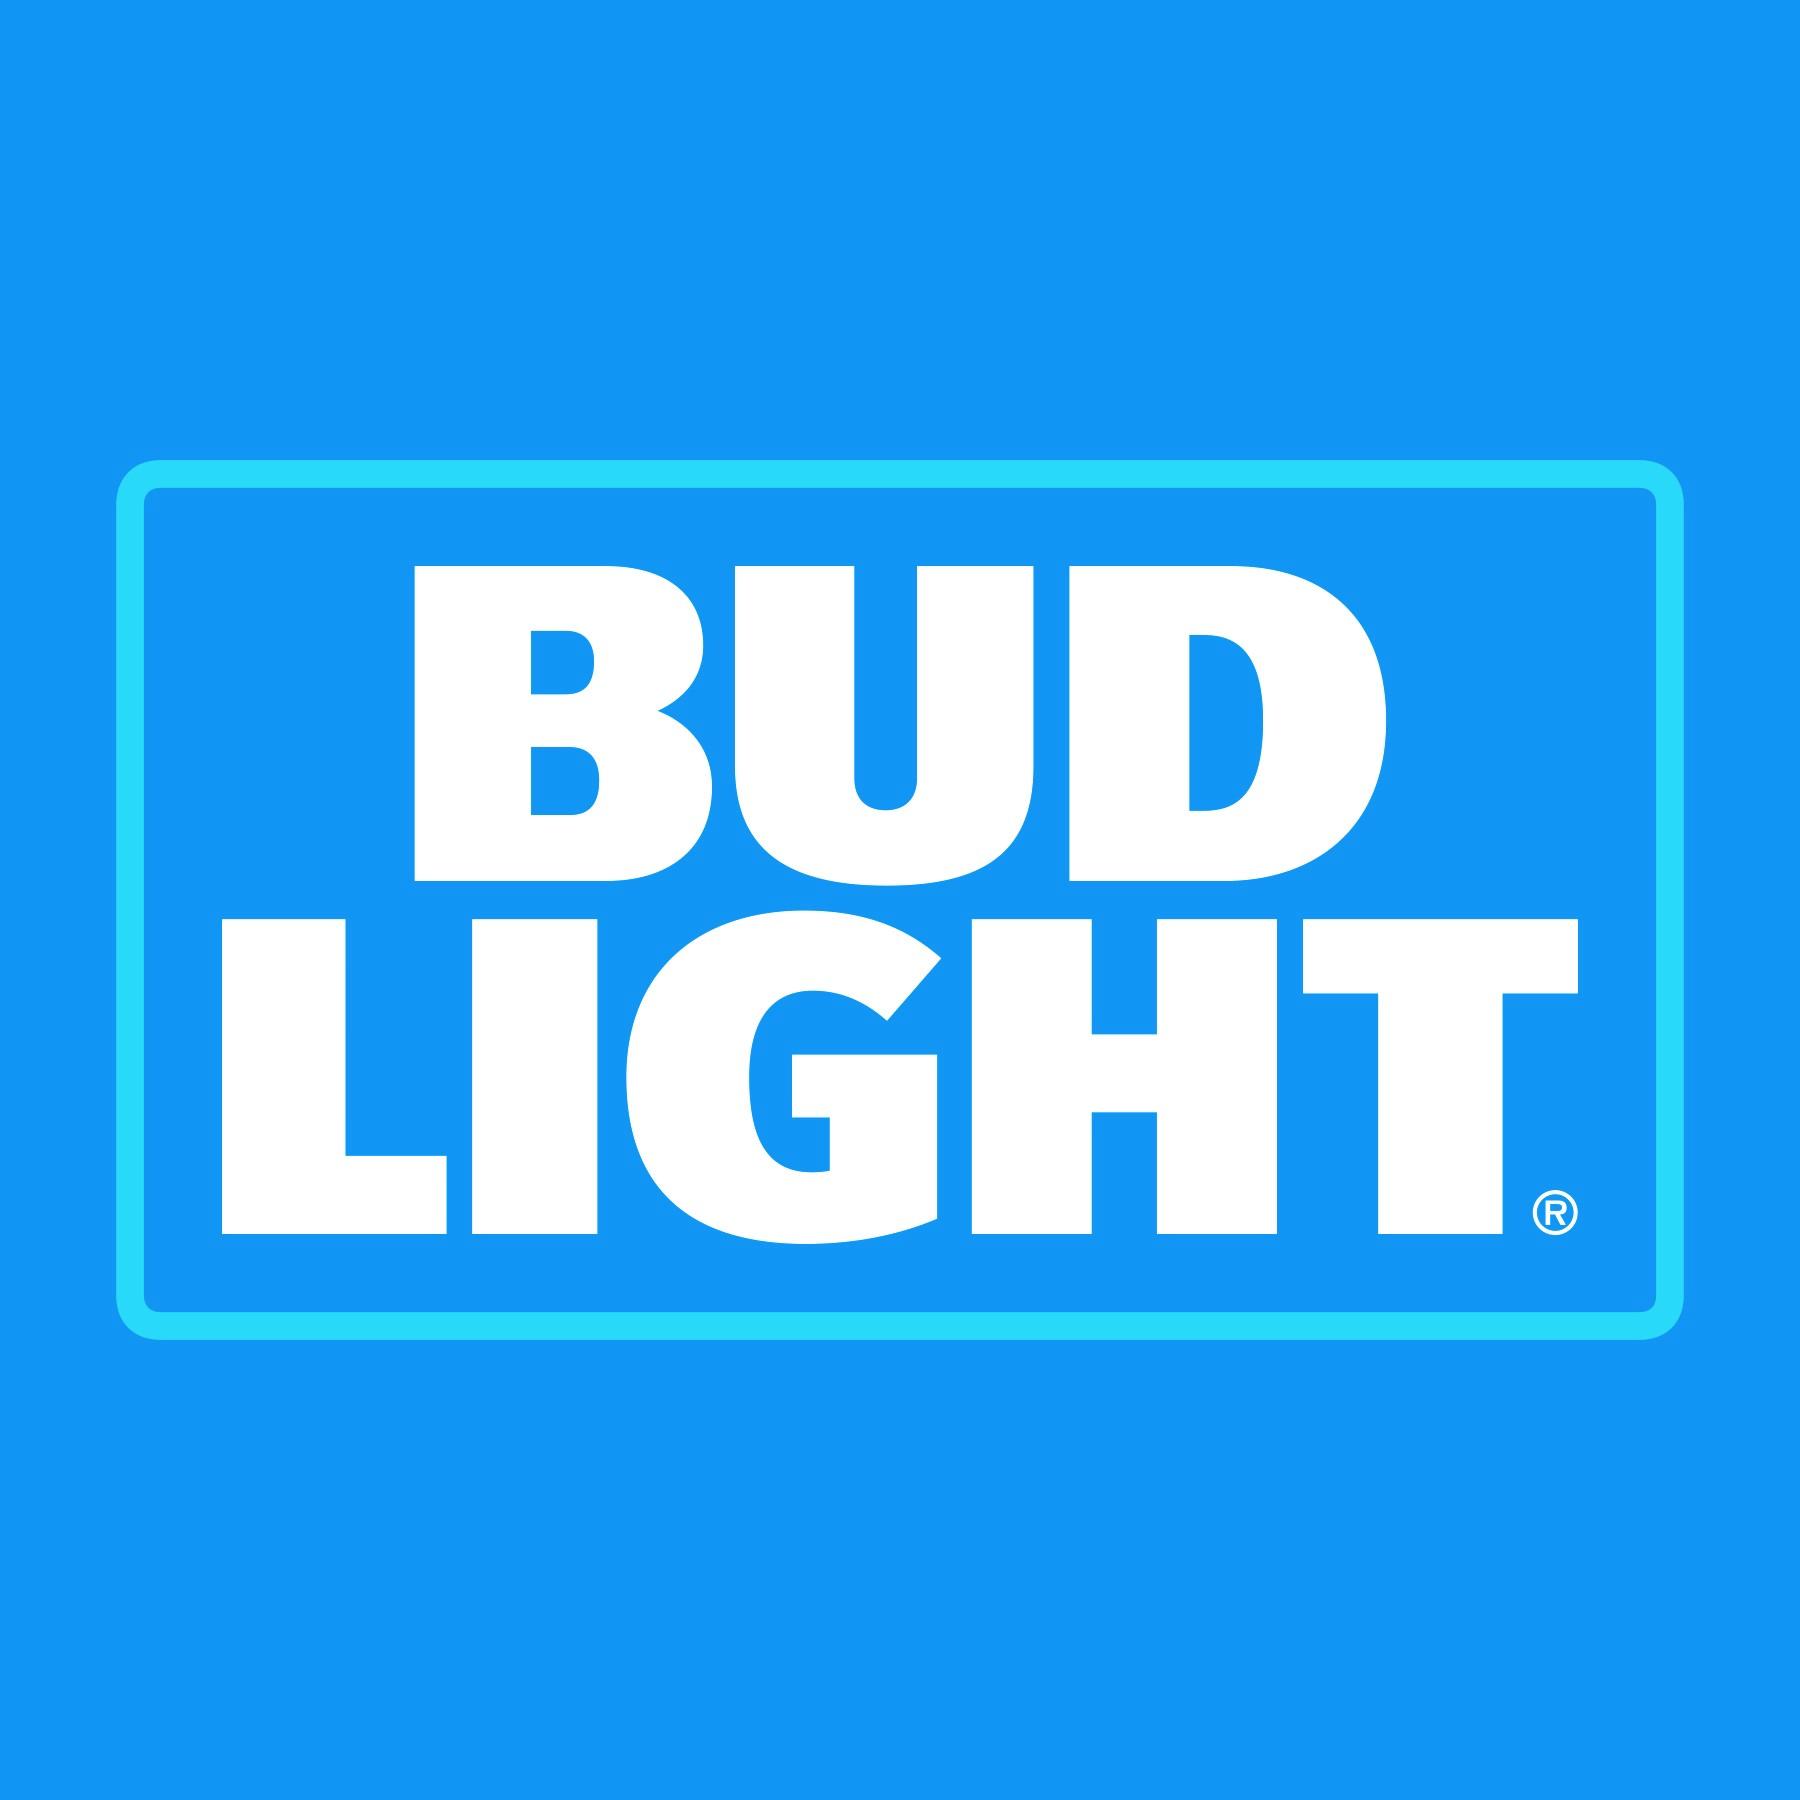 new bud light.jpg